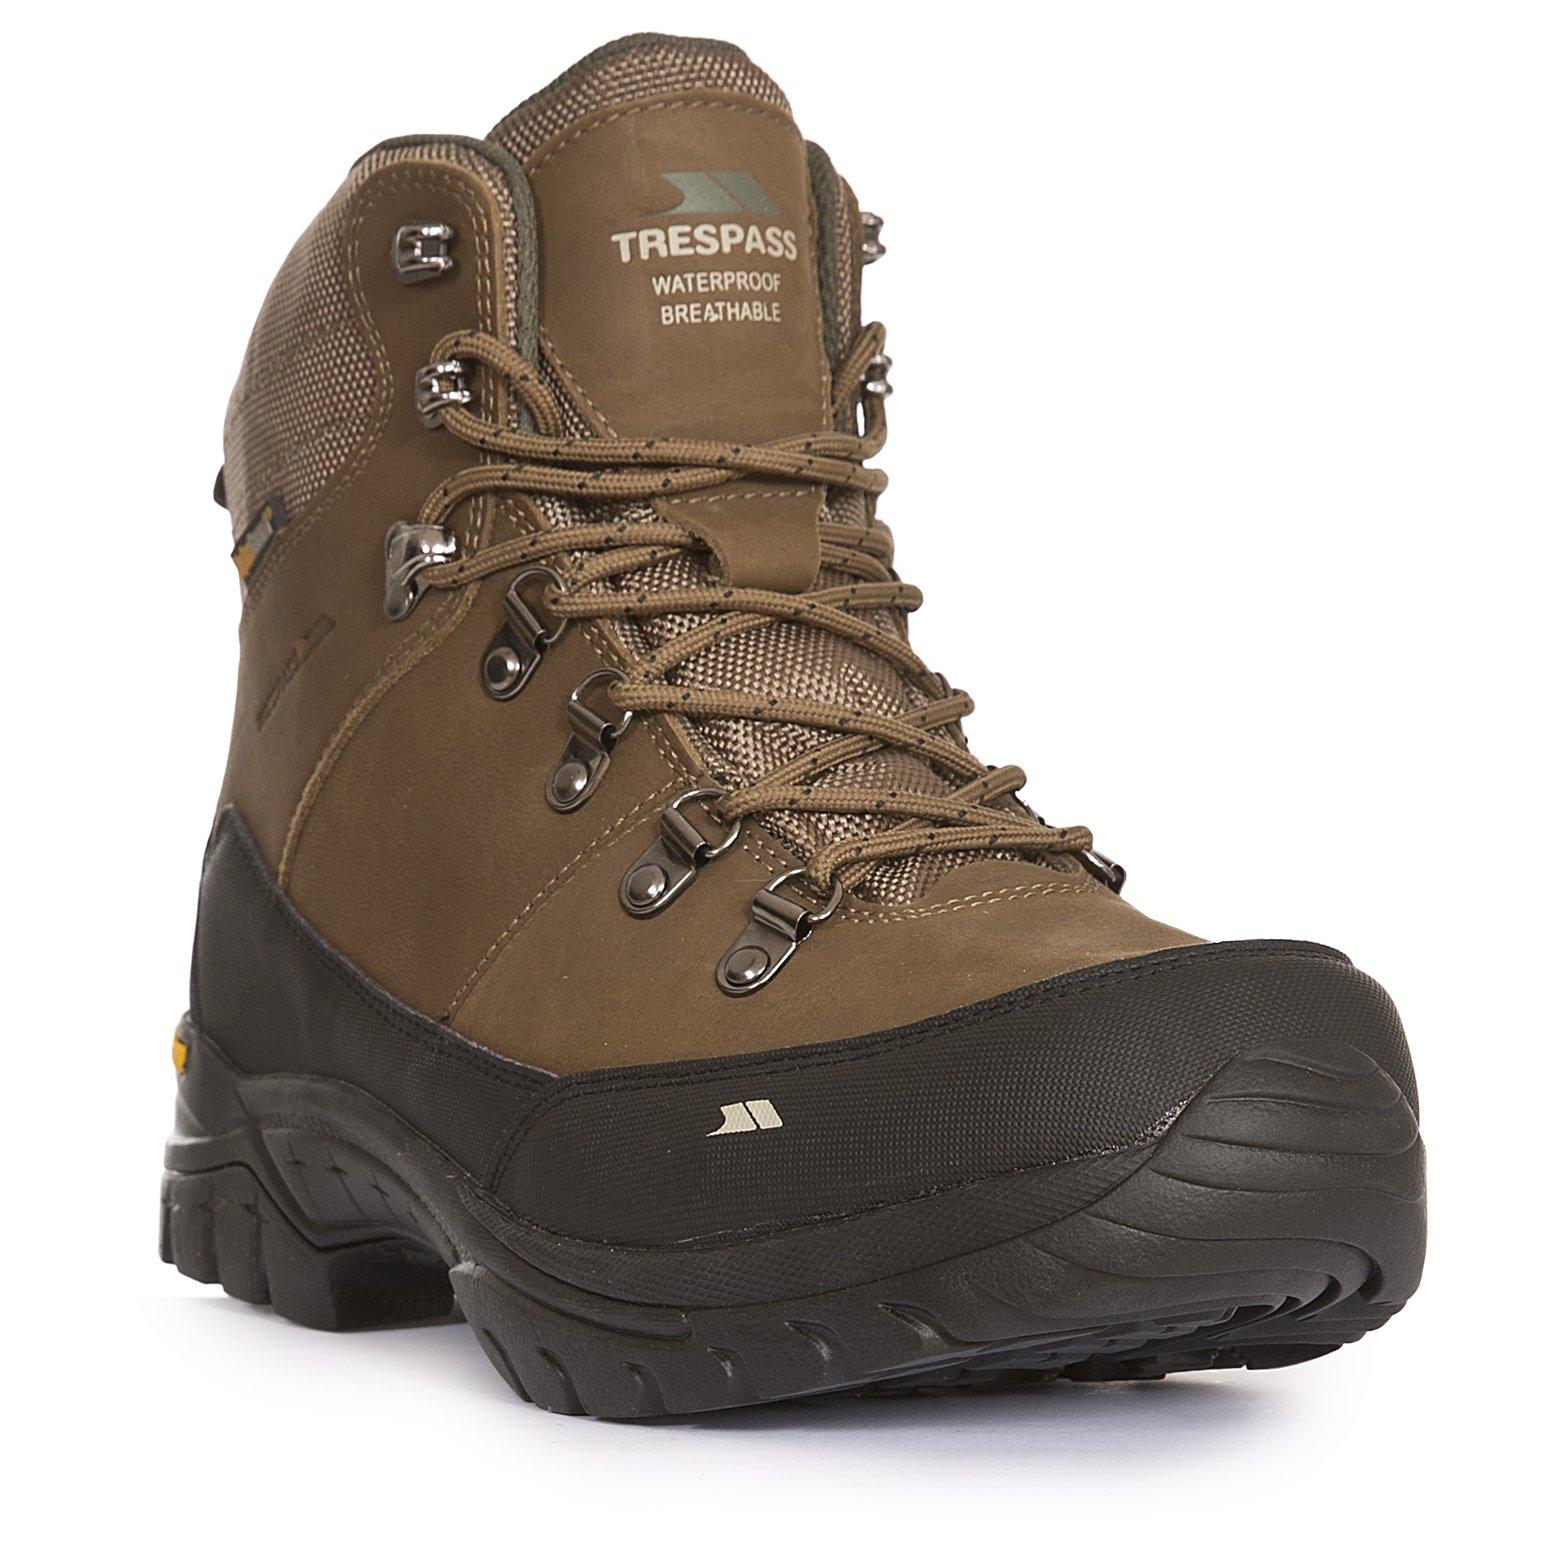 waterproof walking boots carmack menu0027s vibram walking boots | trespass eu MYRGXVL